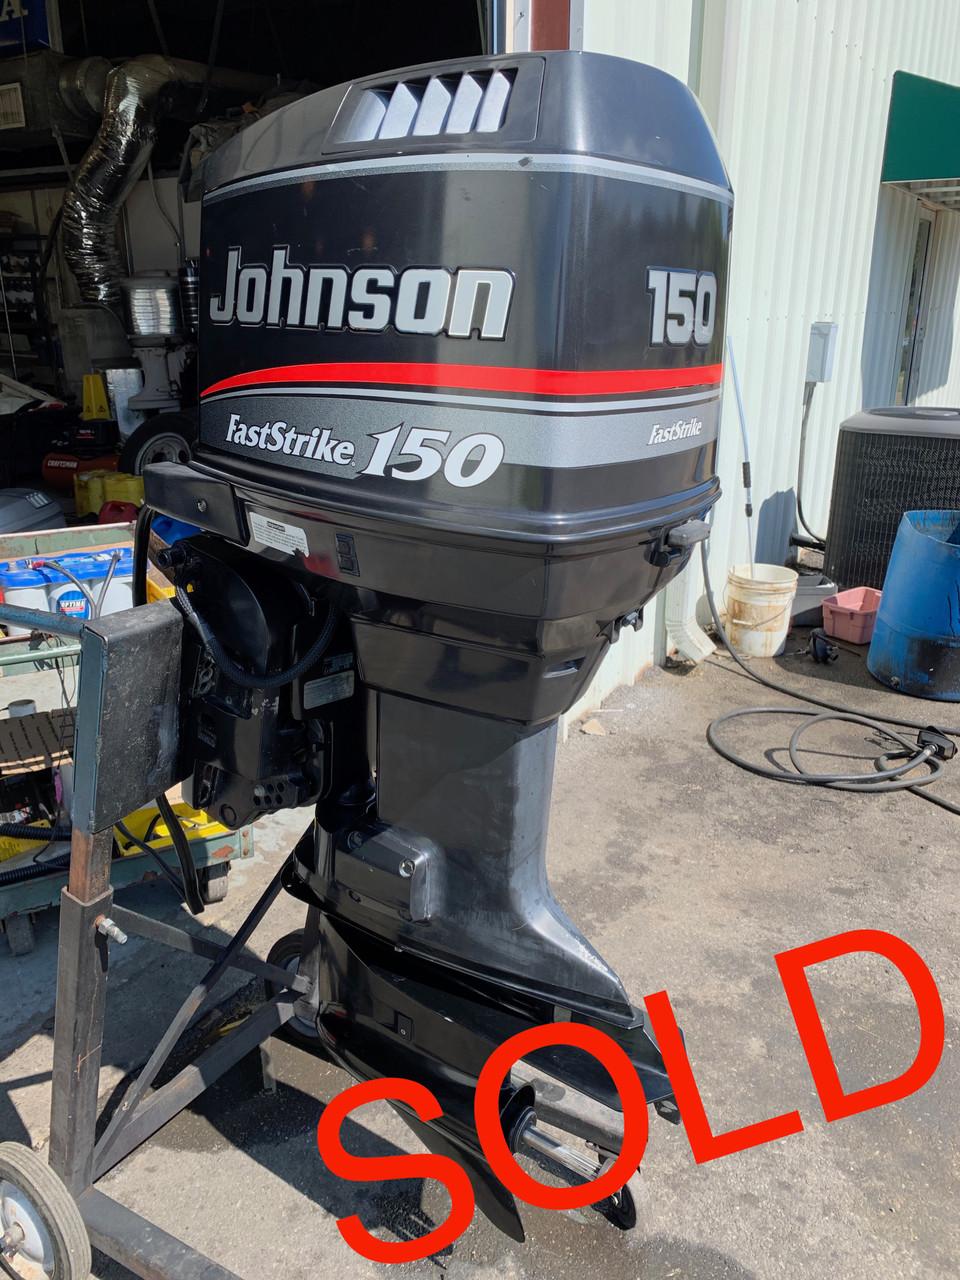 "1998 Johnson FastStrike 150 HP V6 2 Stroke 20"" (L) Outboard Motor"